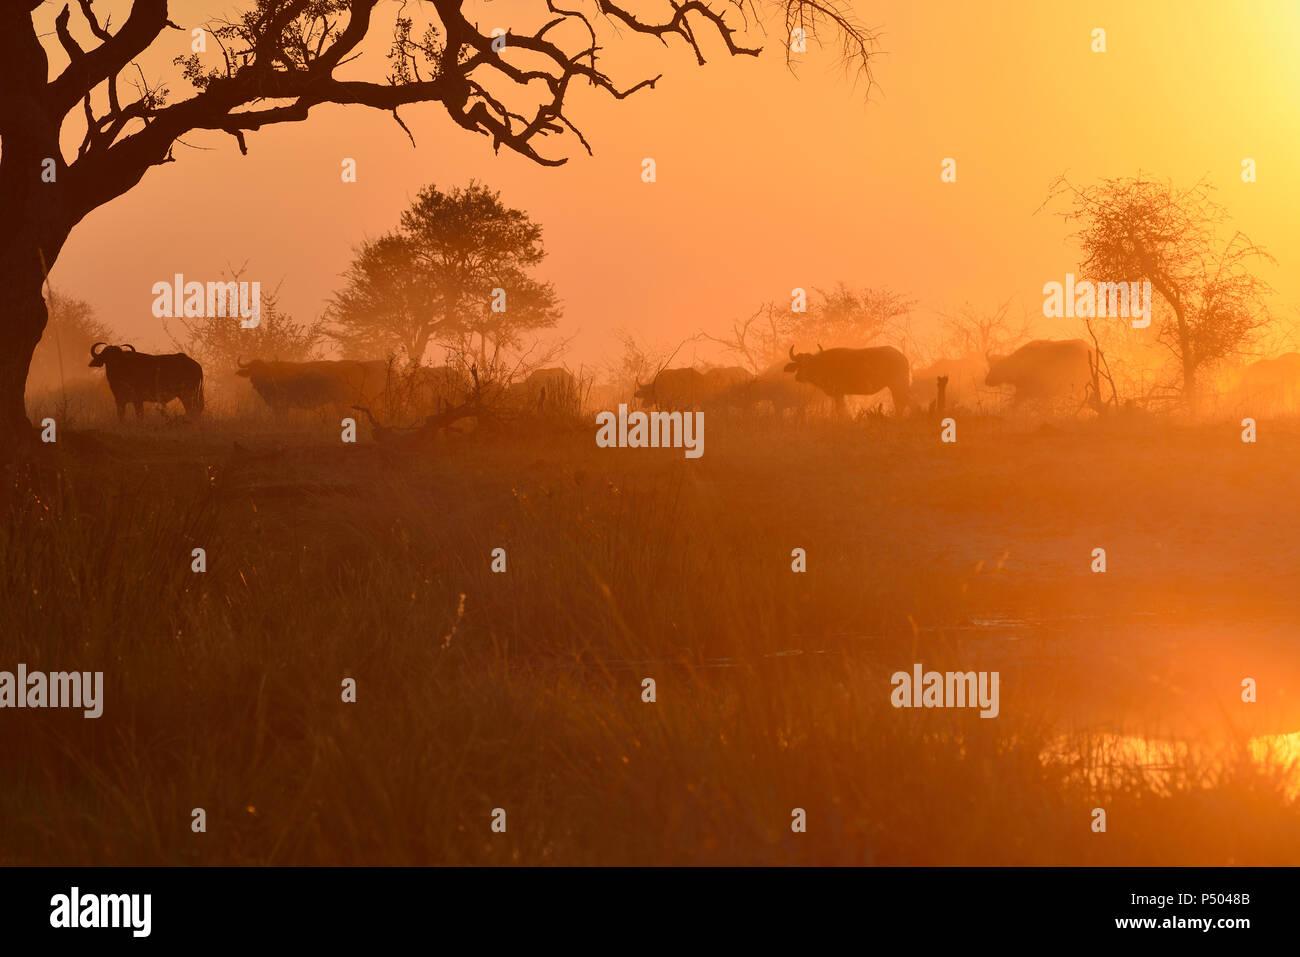 Africa, Namibia, Bwabwata National Park, Kwando Core Area, herd of buffalos - Stock Image